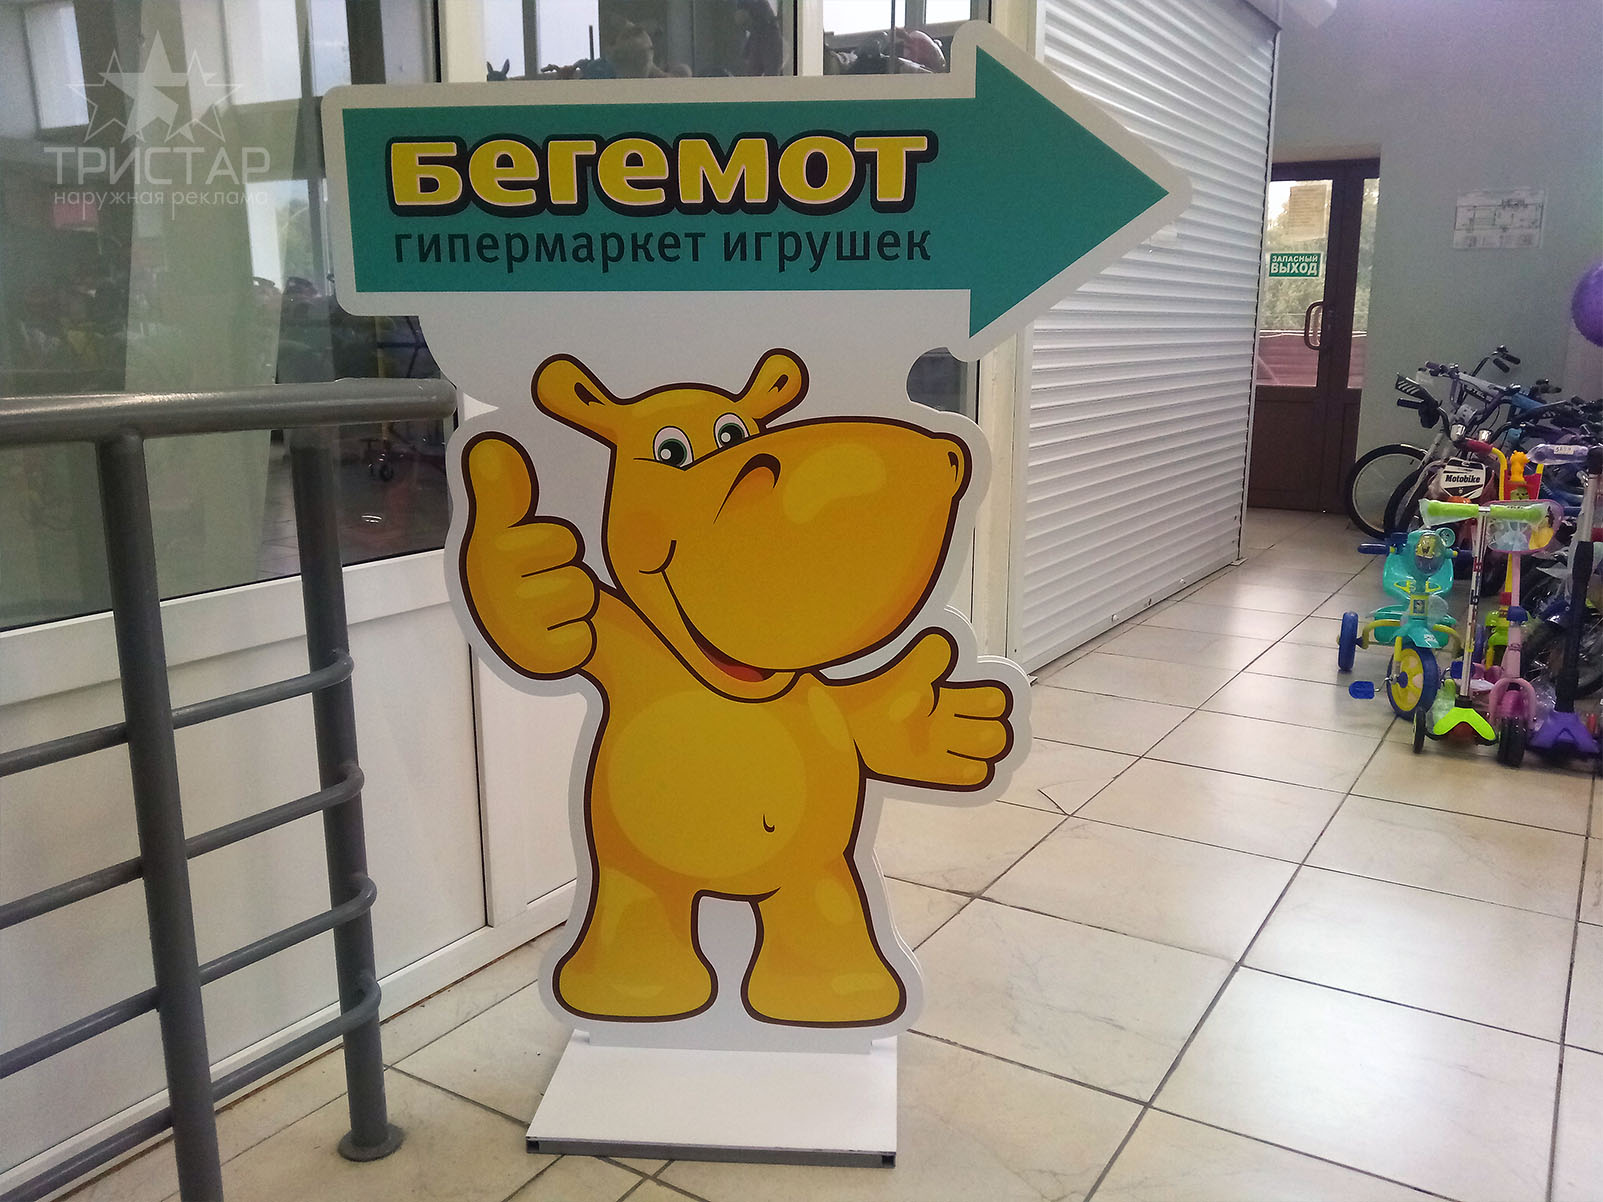 TS_begemotik_stender_1